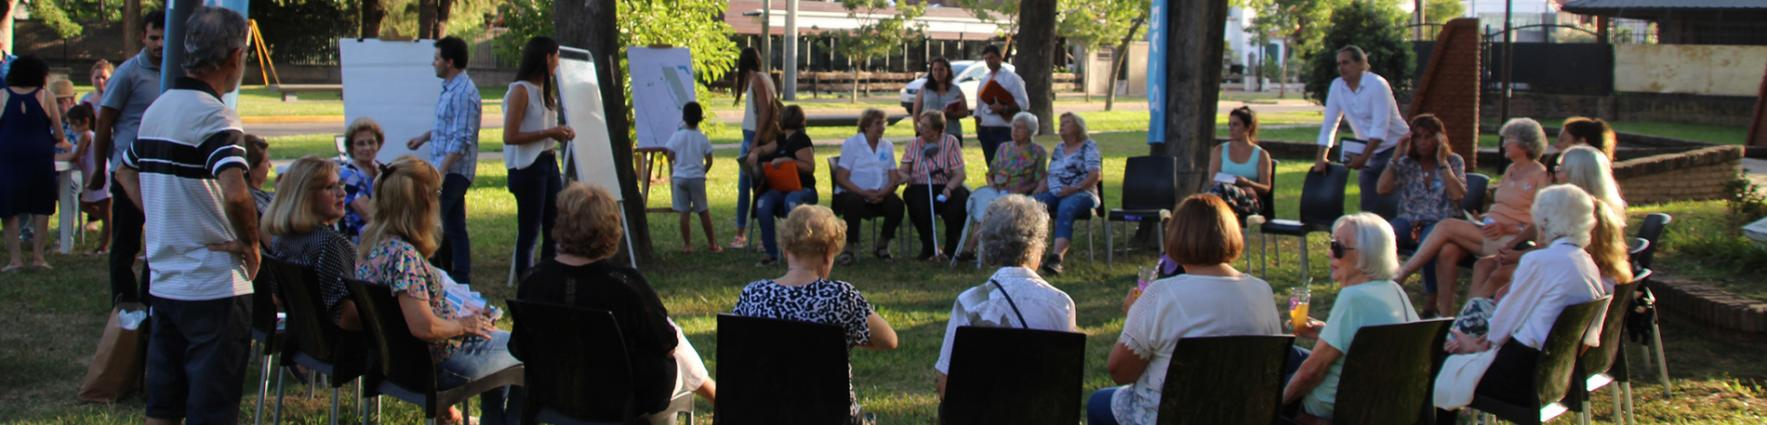 Consejo barrial en Plaza Cossettini